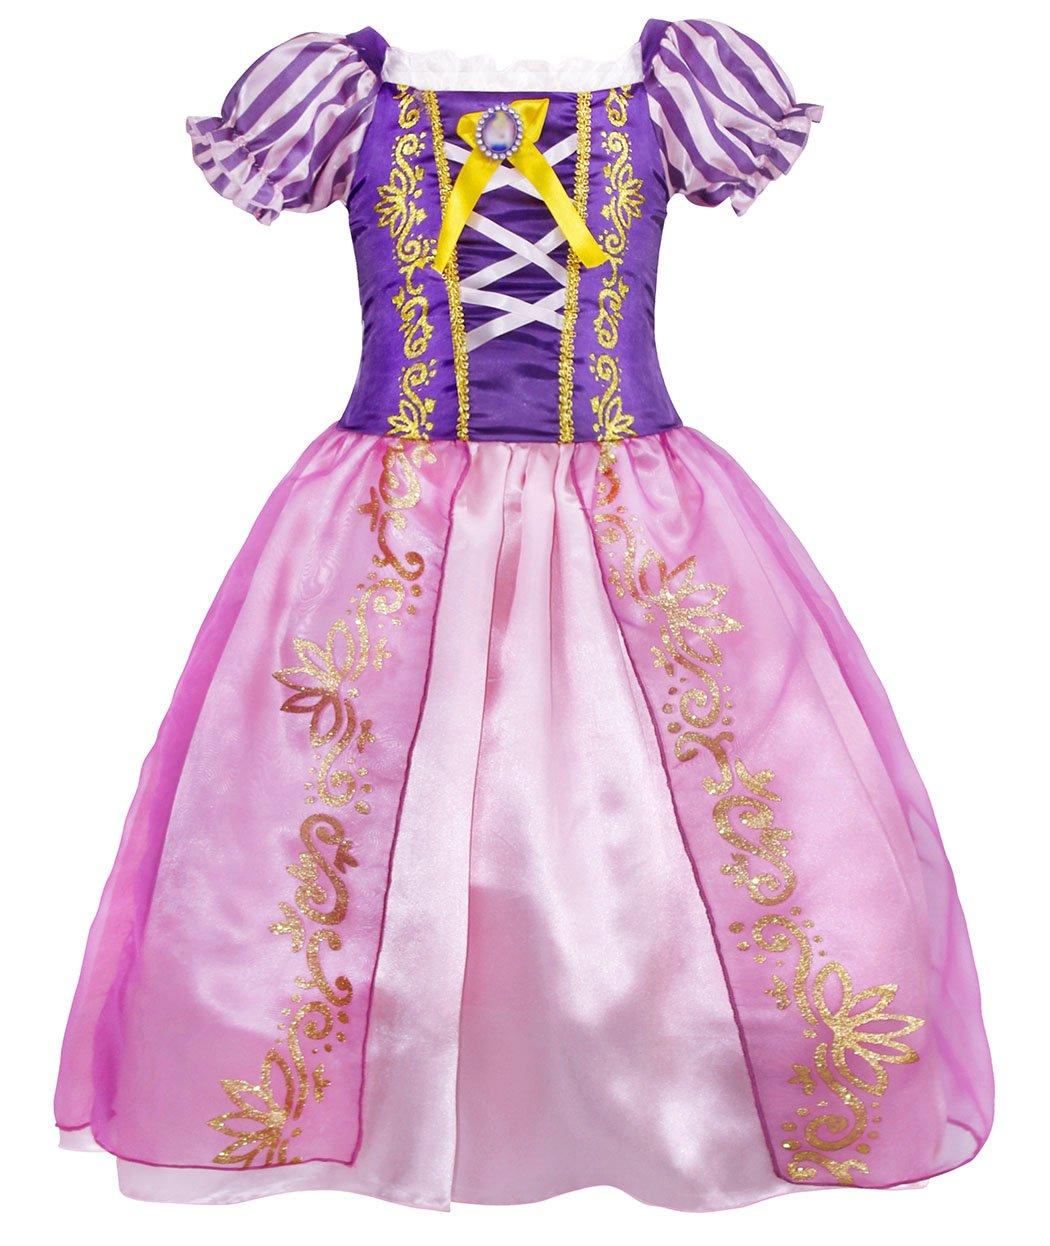 - 71mZYJerAtL - Cotrio Rapunzel Dress Up for Girls Halloween Princess Costume Birthday Theme Party Dresses